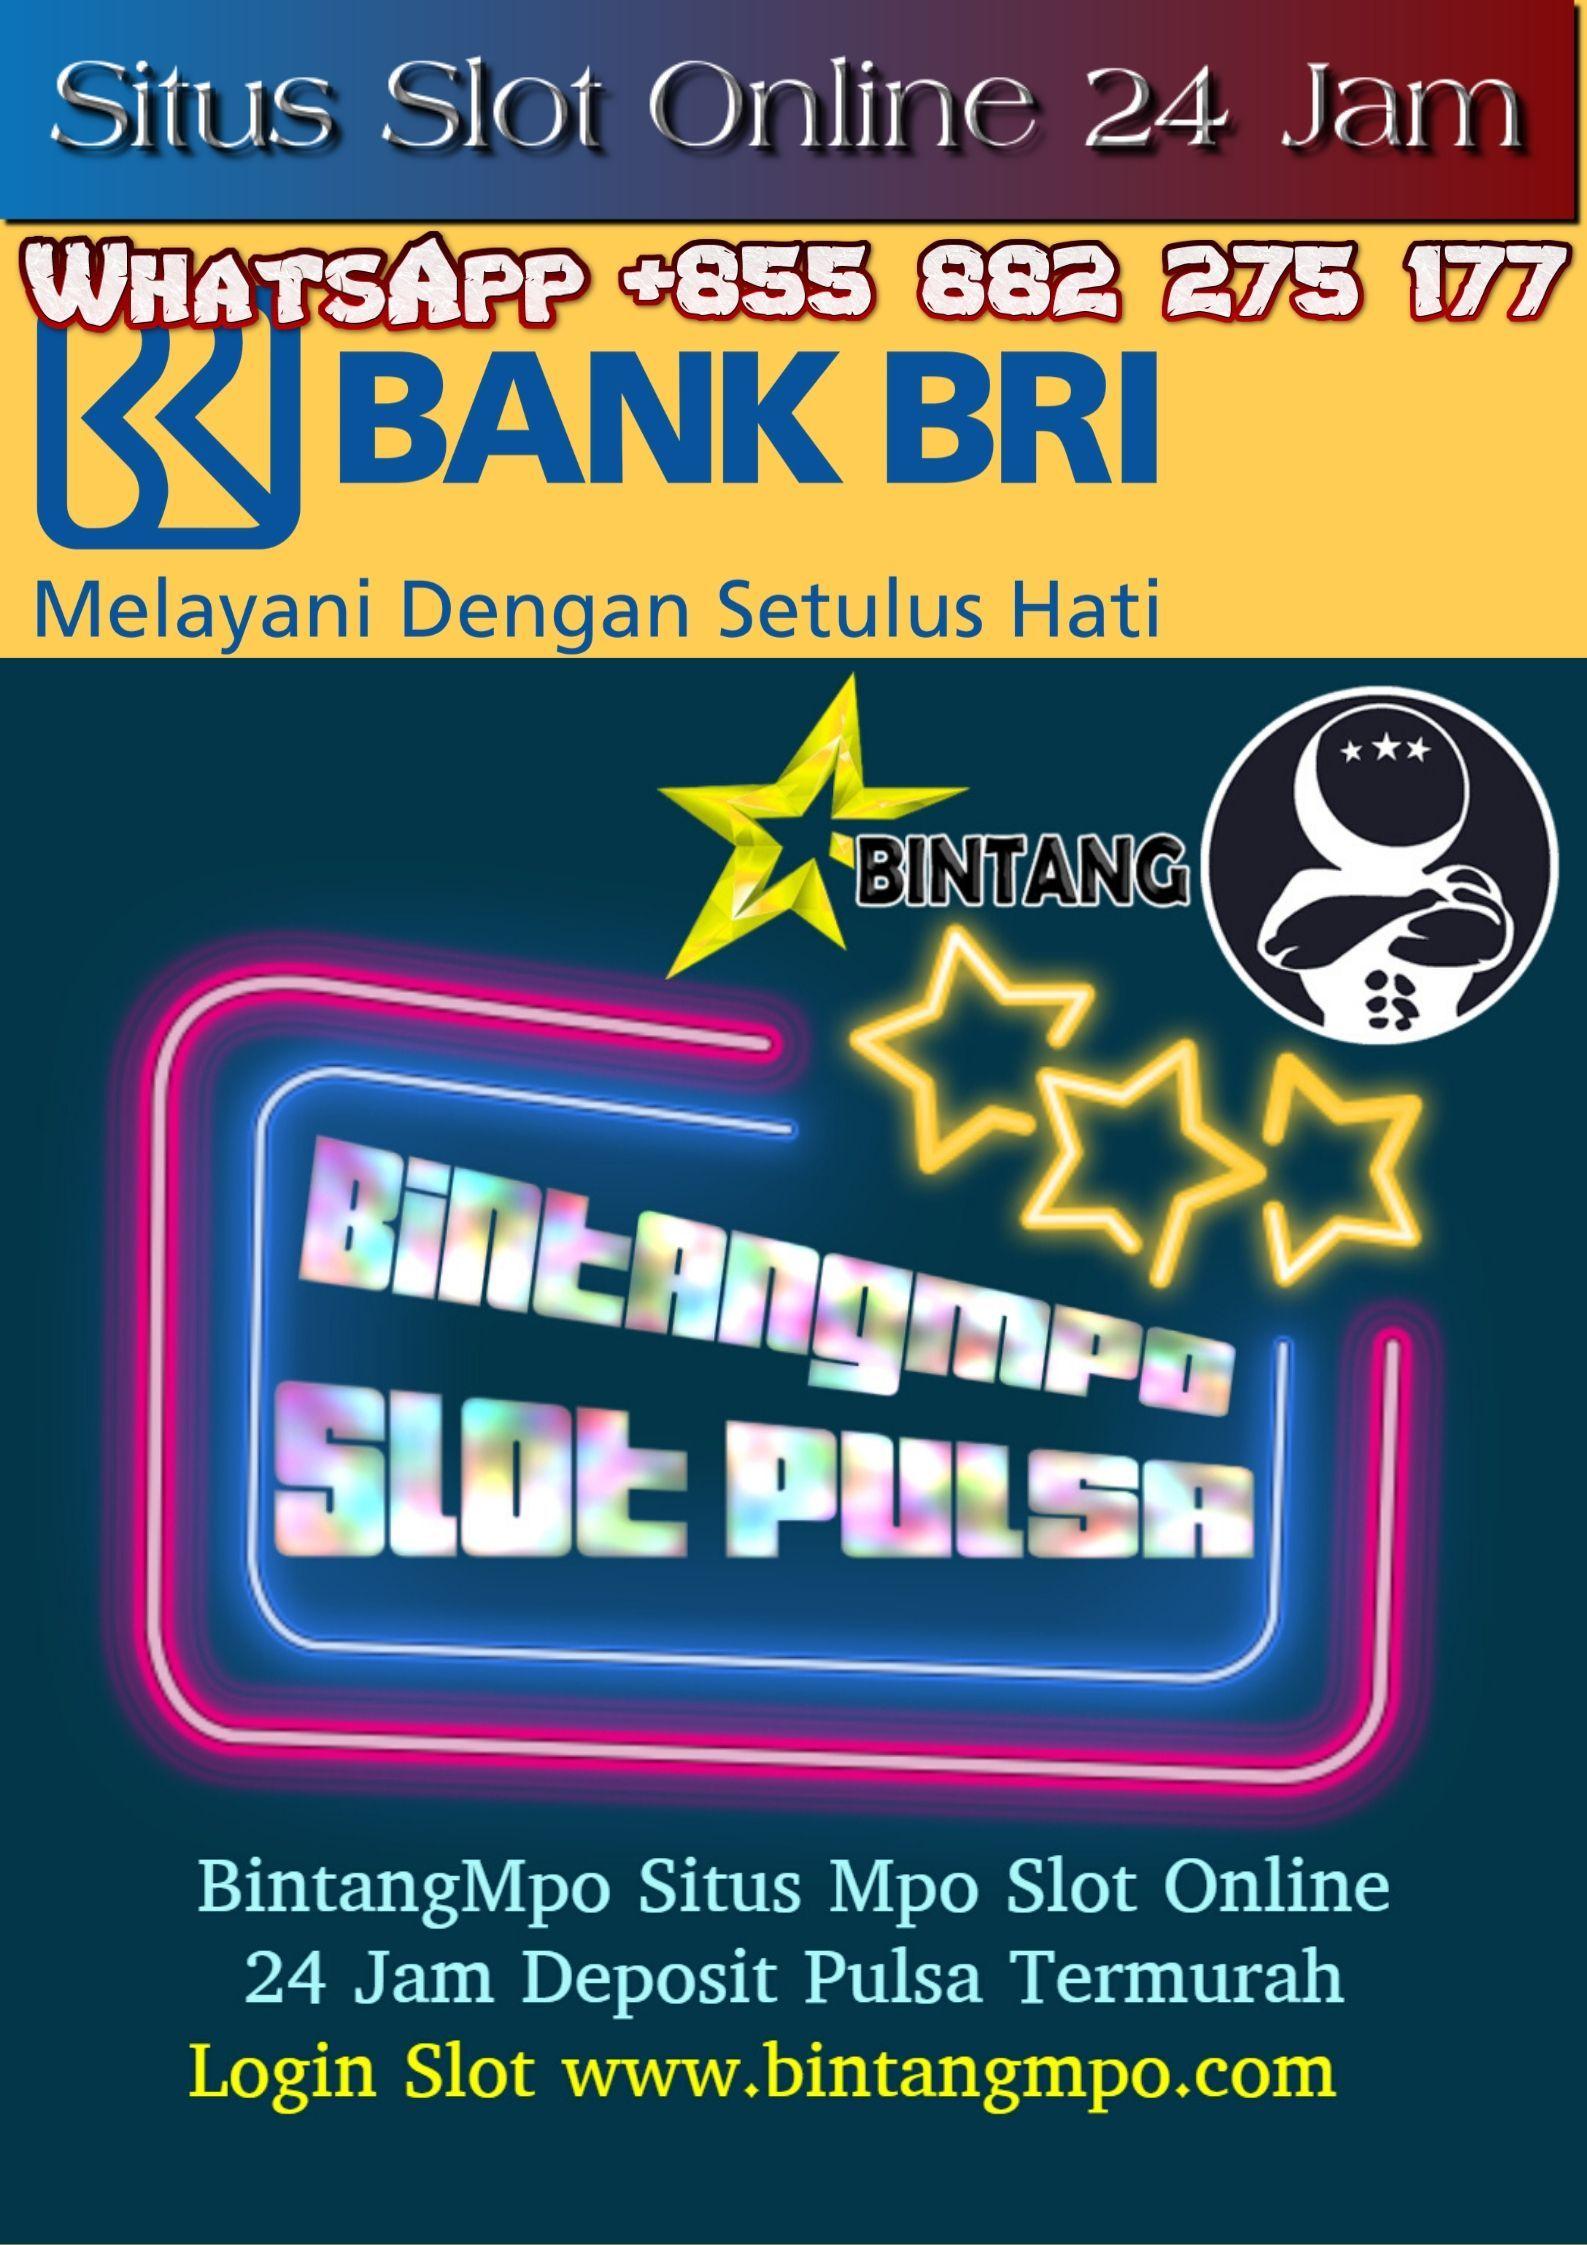 Bintangmpo Situs Slot Bri Online 24 Jam Online Games Slot Online